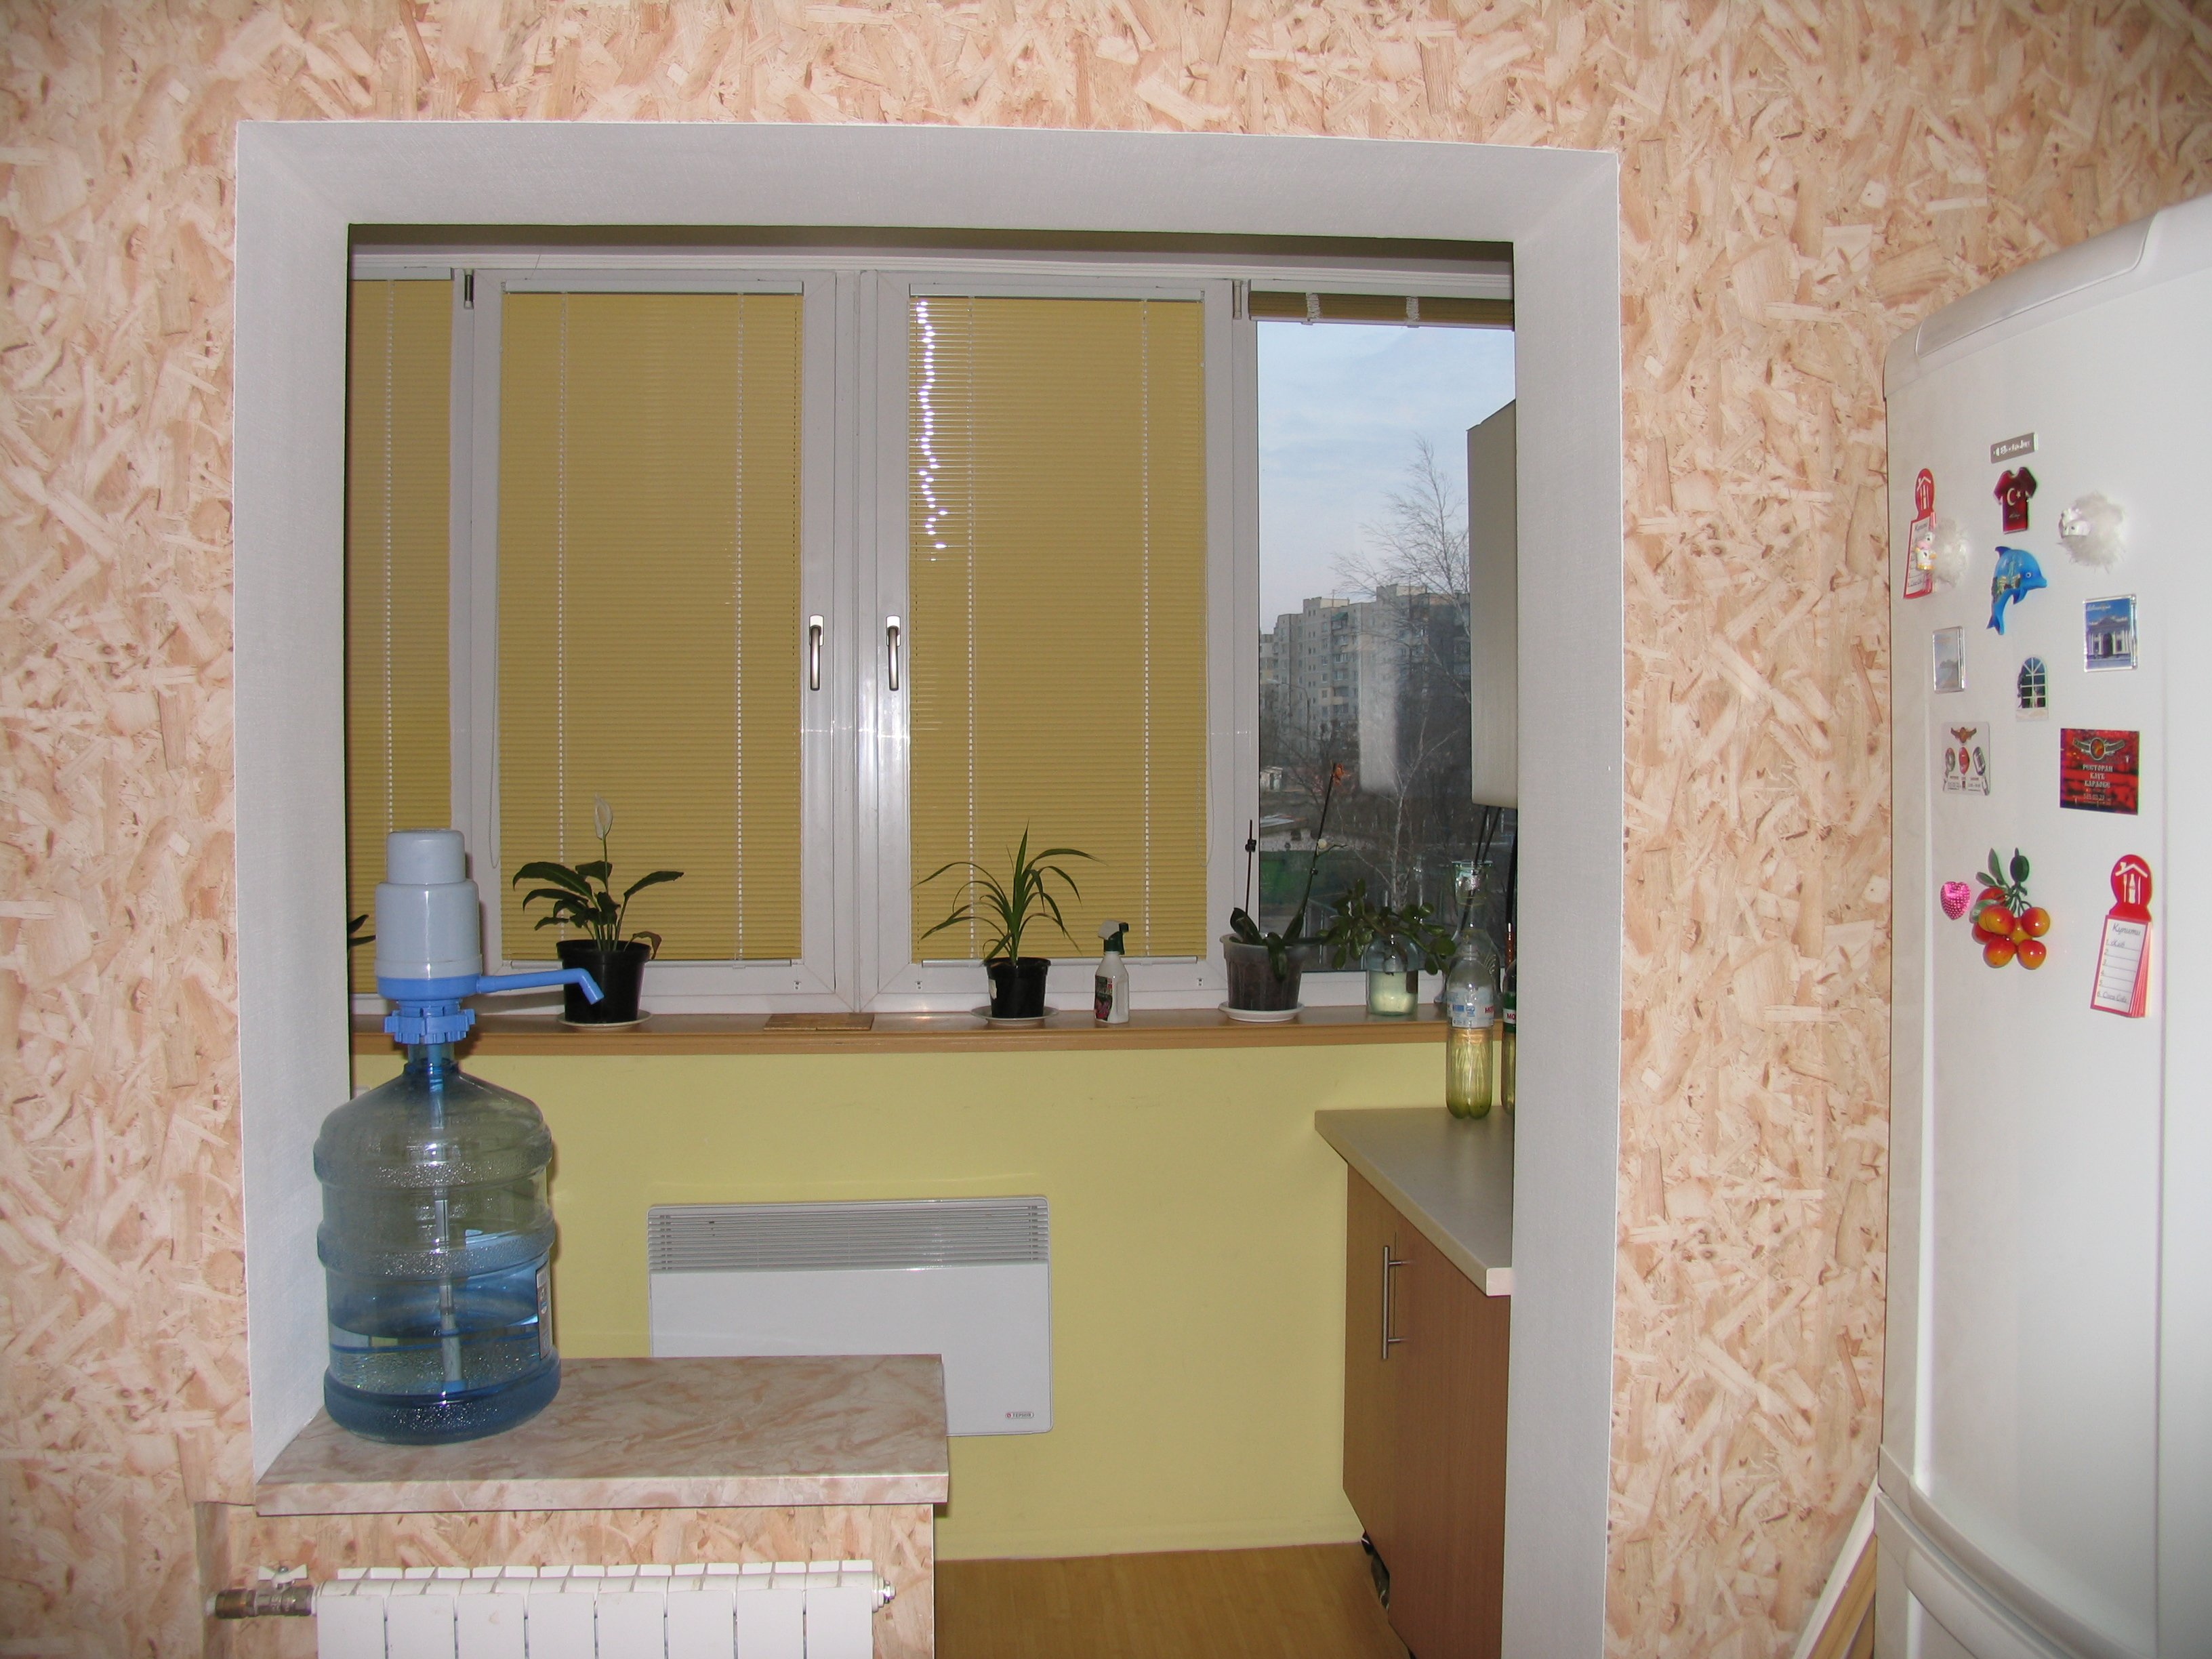 Кухни за счет балкона. - остекление - каталог статей - балко.